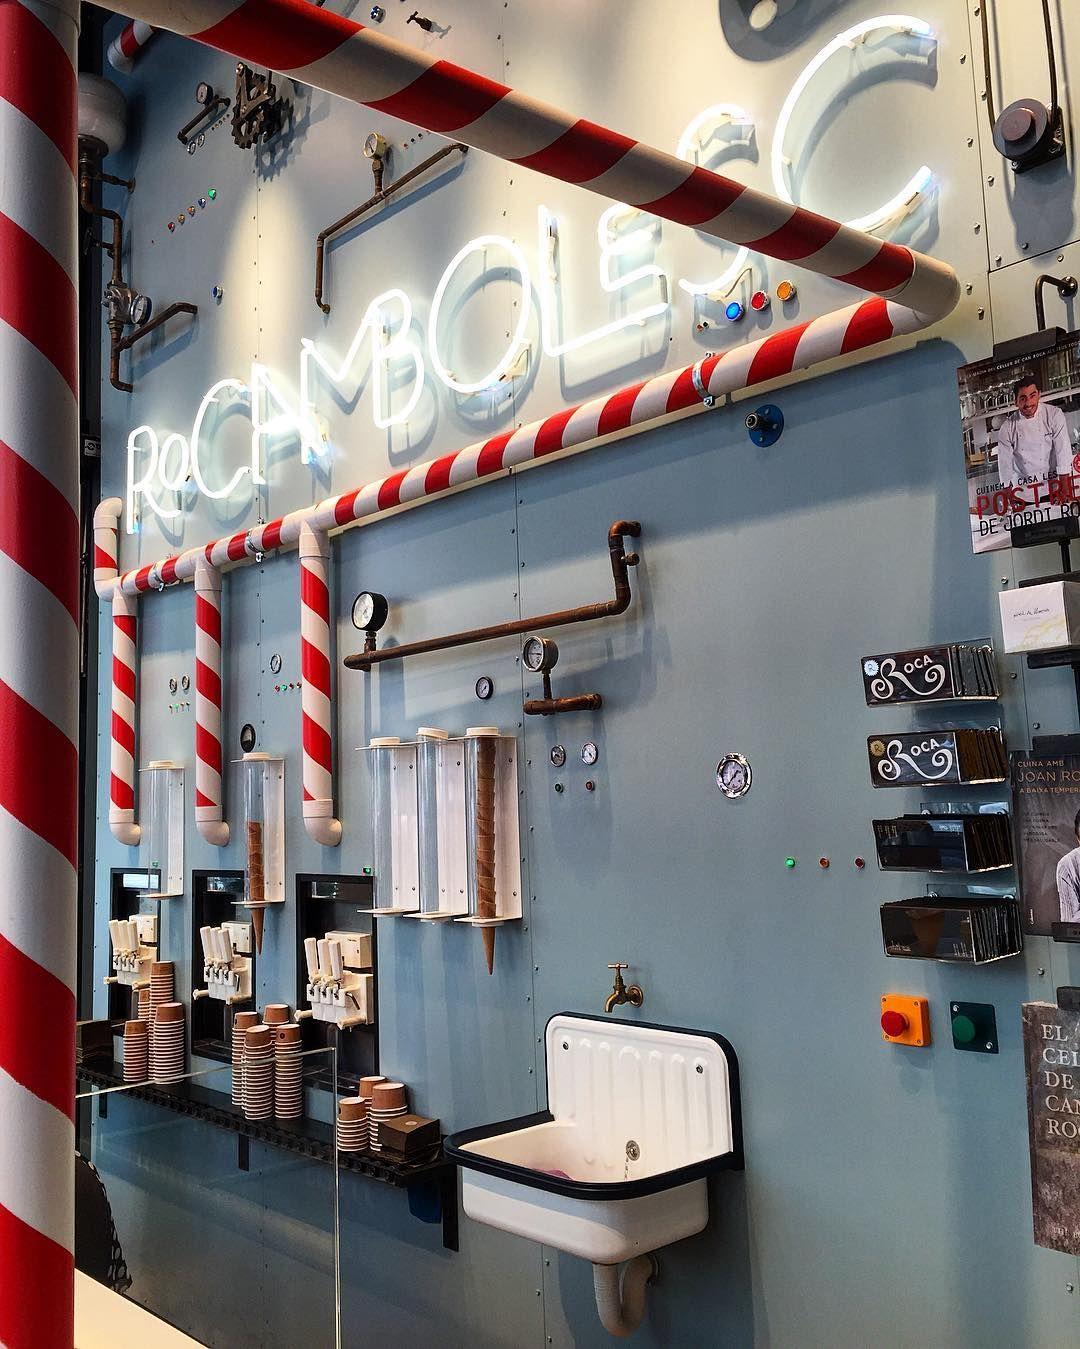 Rocambolesc ice cream shop in Barcelona | Diseños para negocios ...